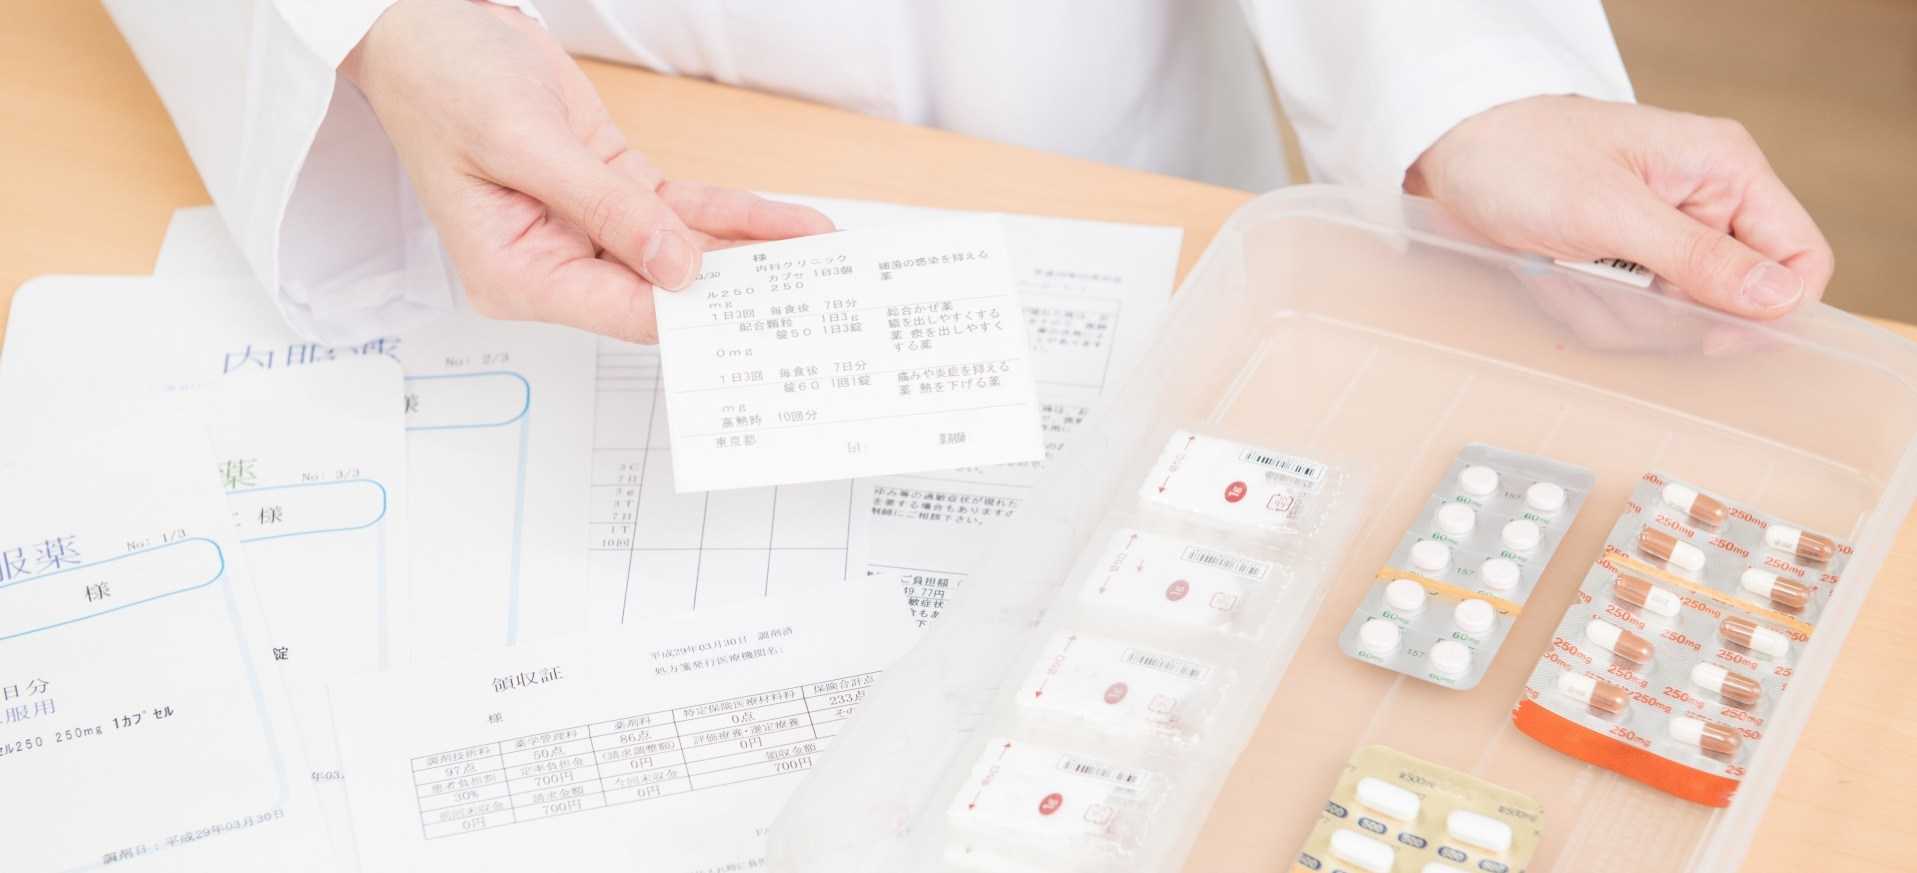 AGA治療薬の気になる効果と副作用